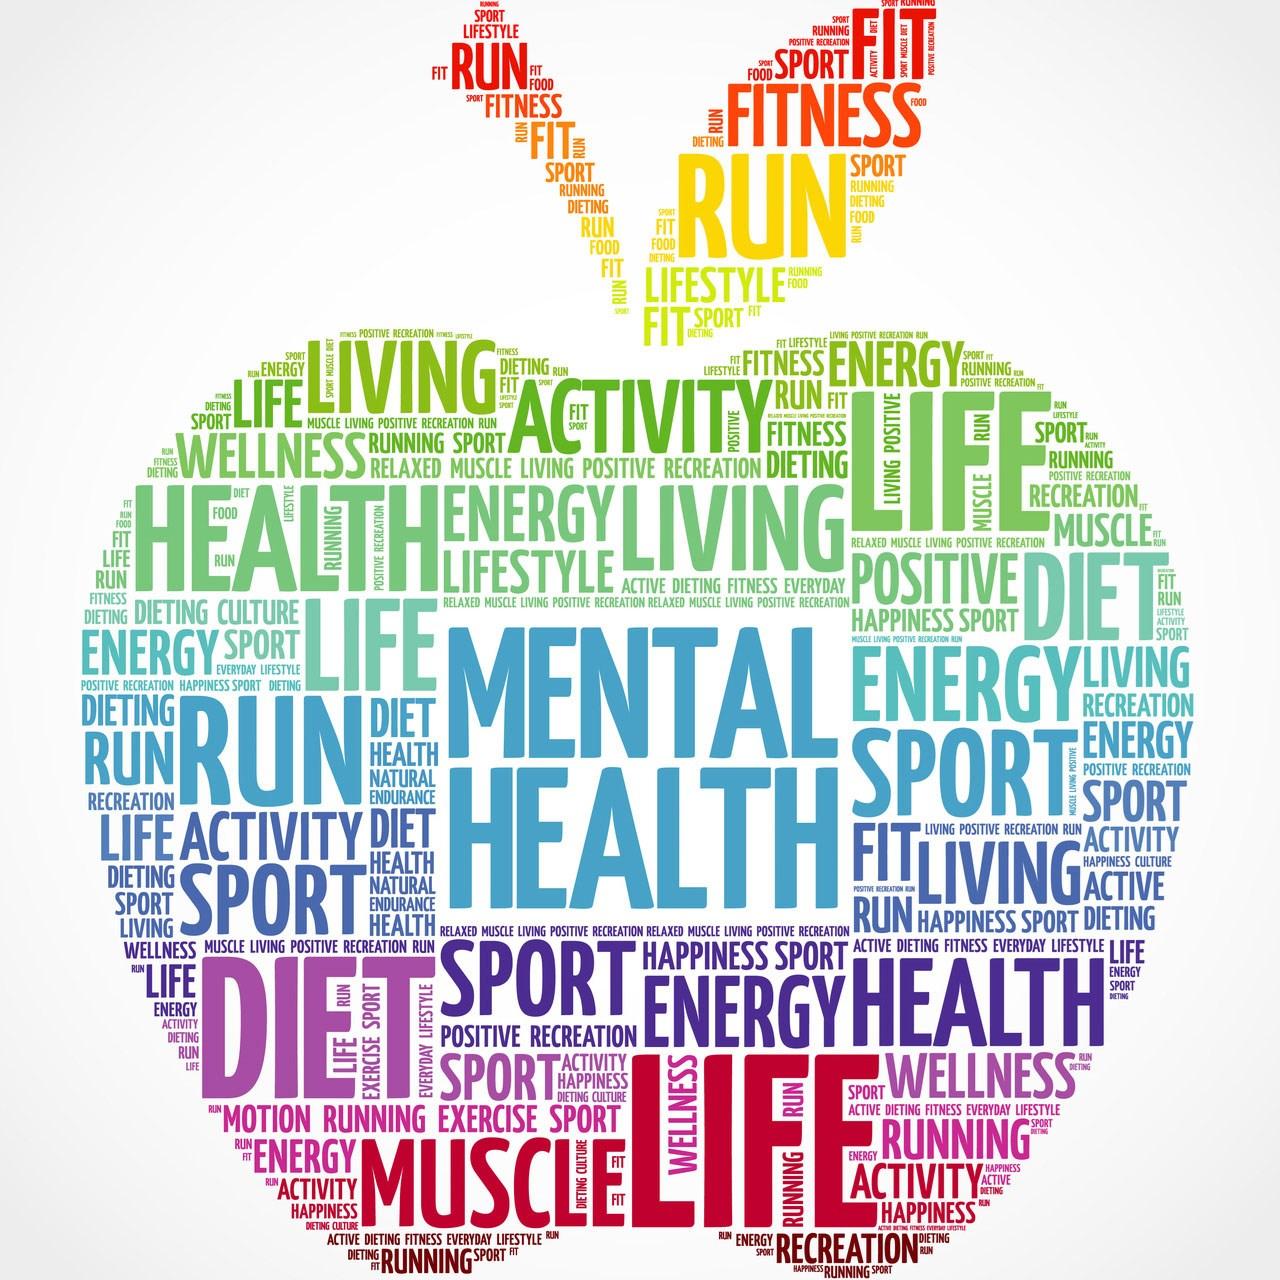 Mental Health 400 x 400.jpg